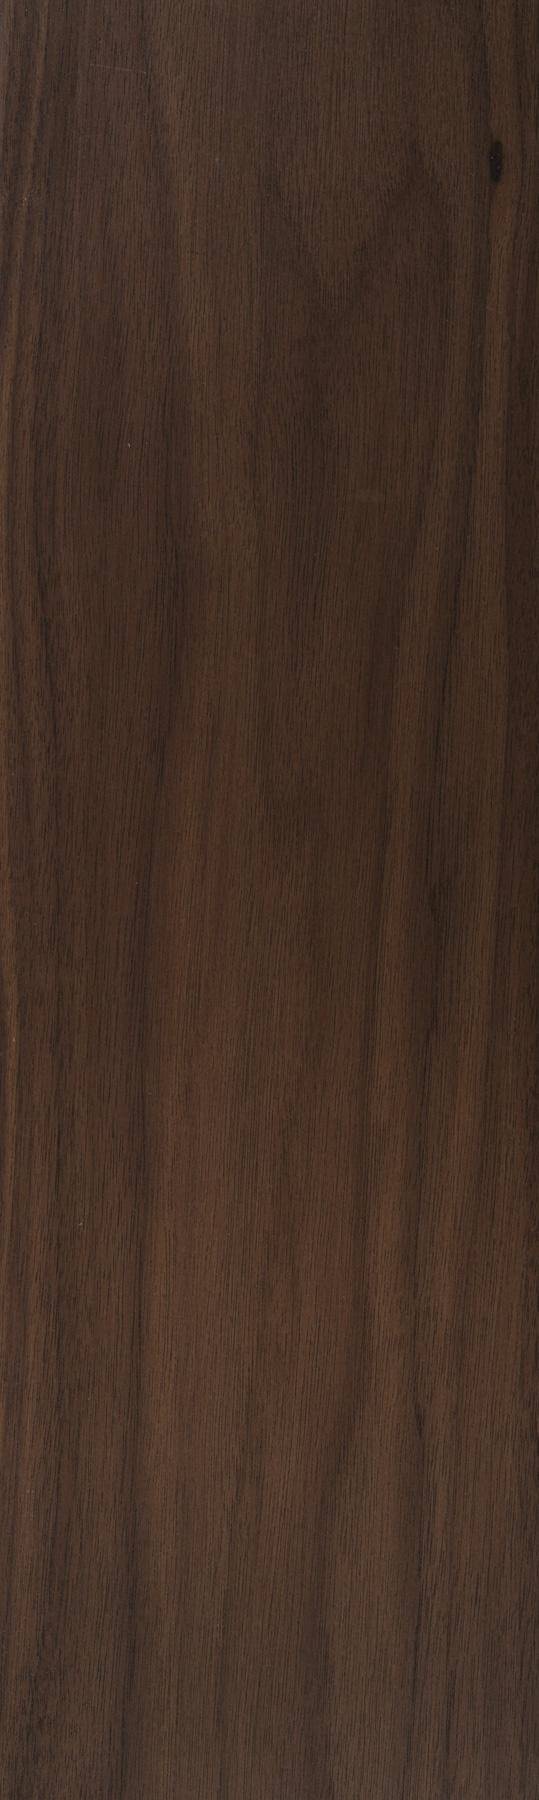 maderas-terramont-loft-mate-american-walnut